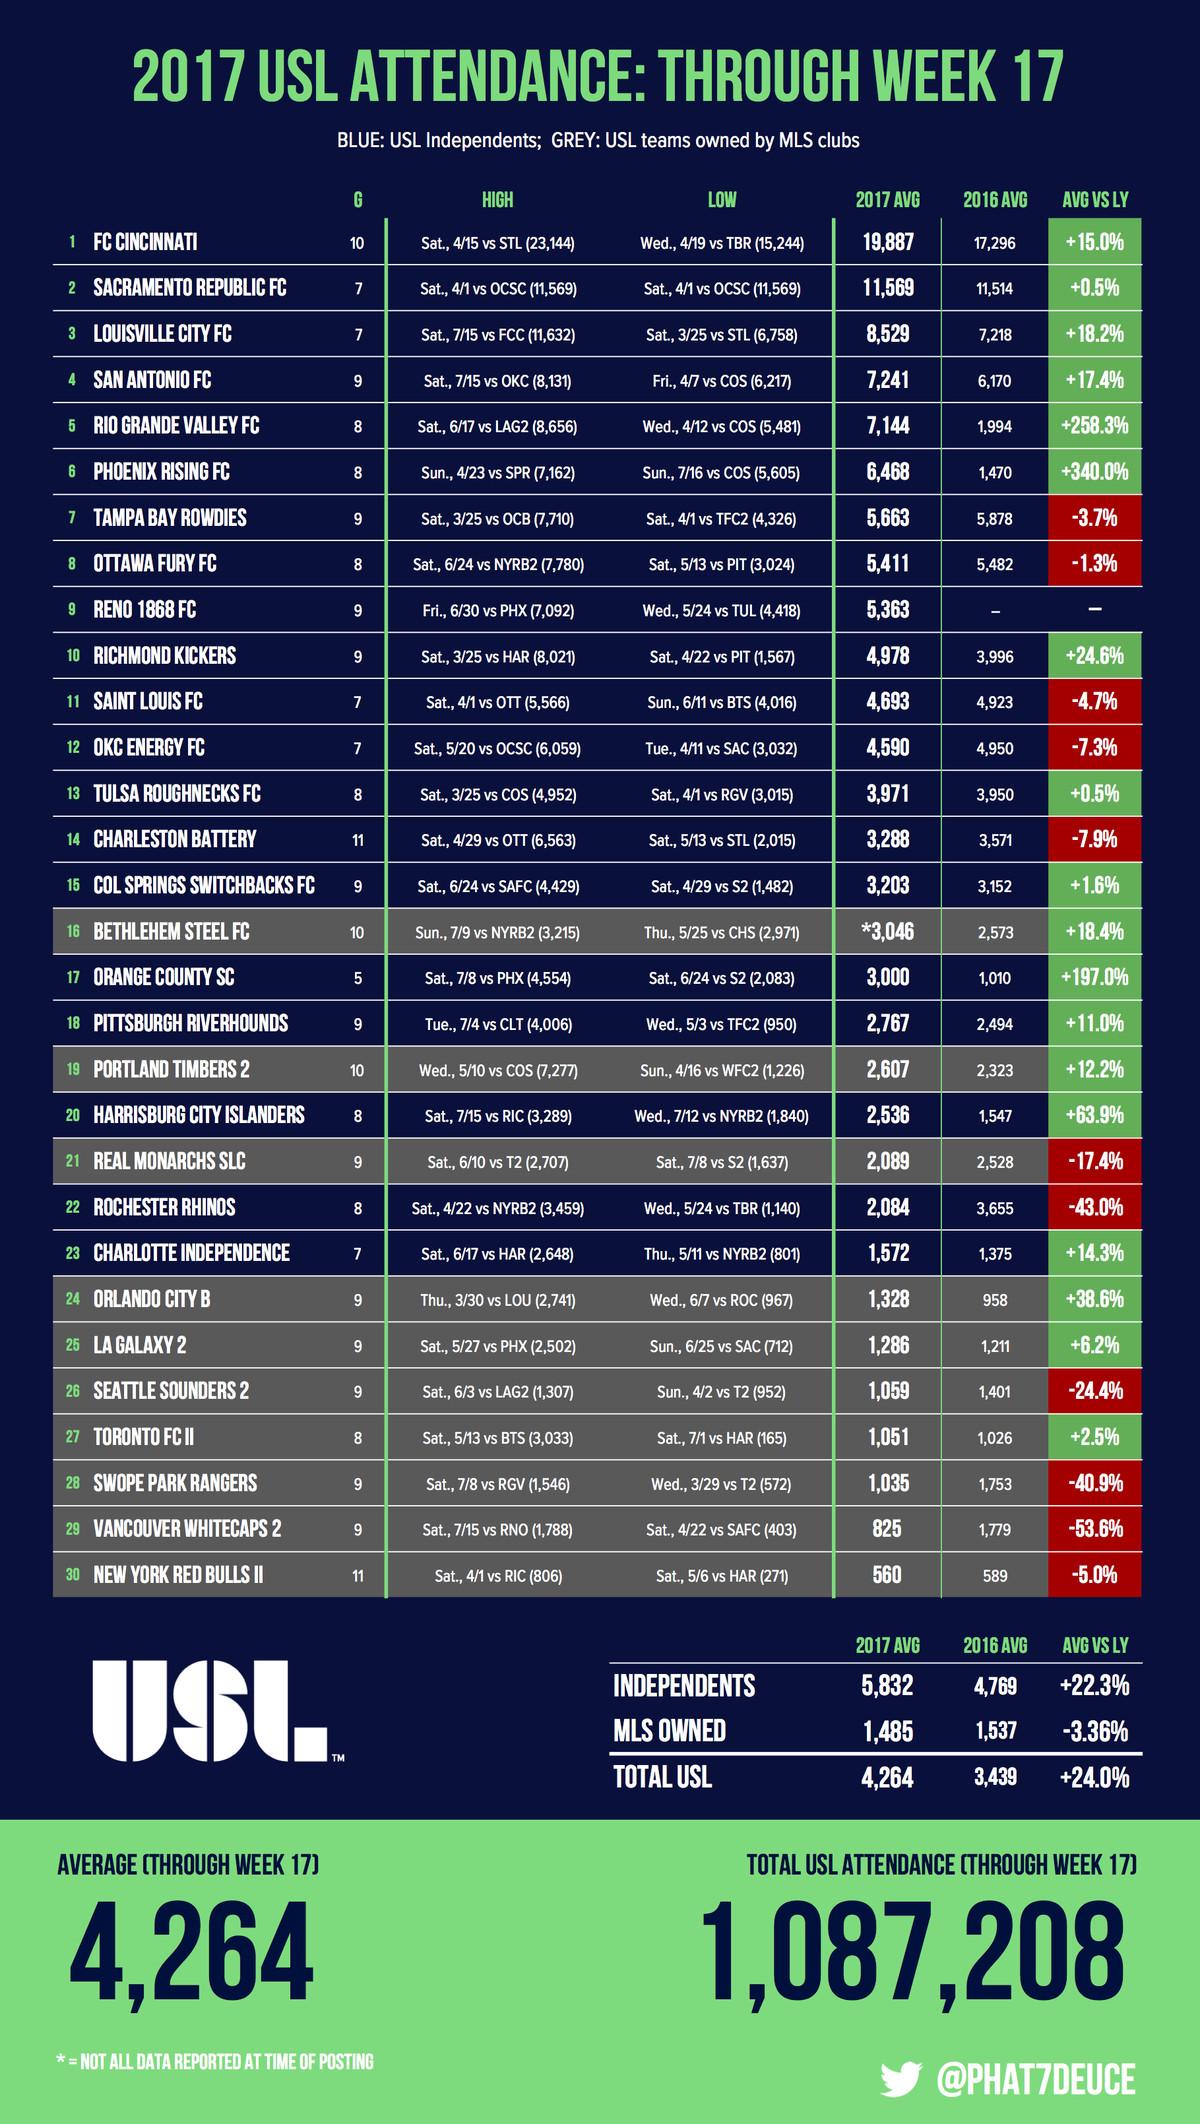 2017 USL Attendance: Through Week 17